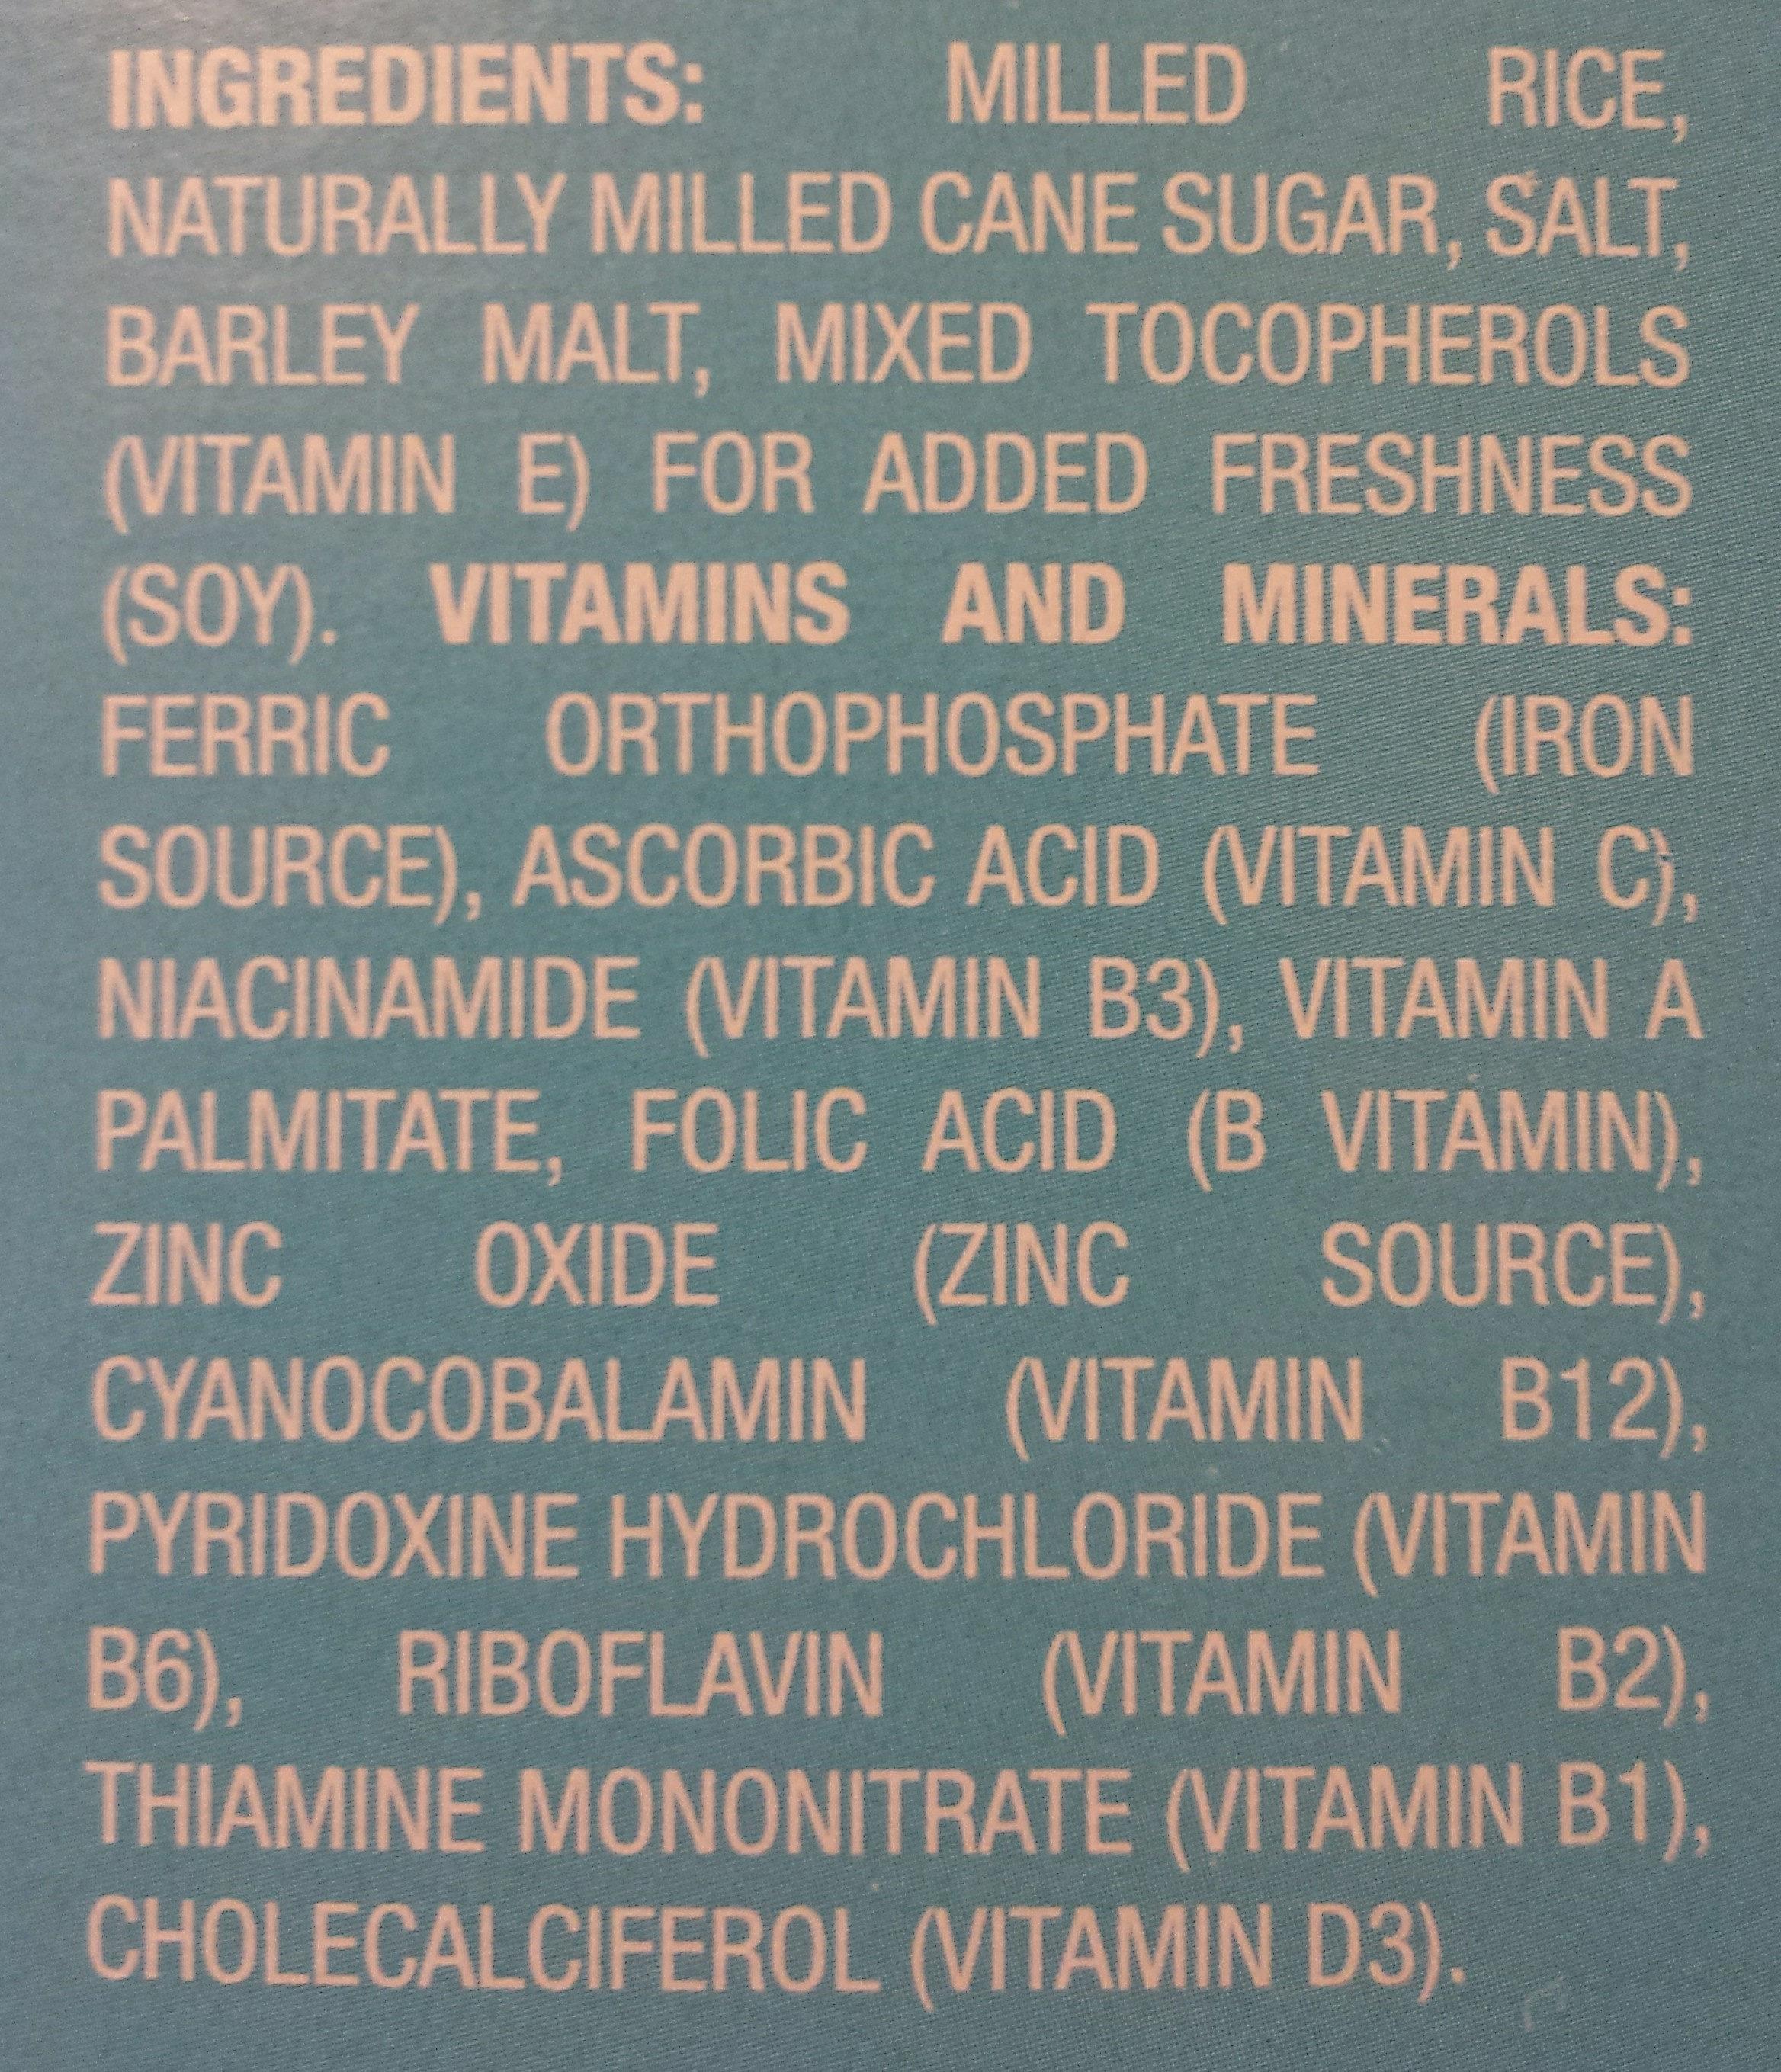 Crisp Rice Cereal - Ingredients